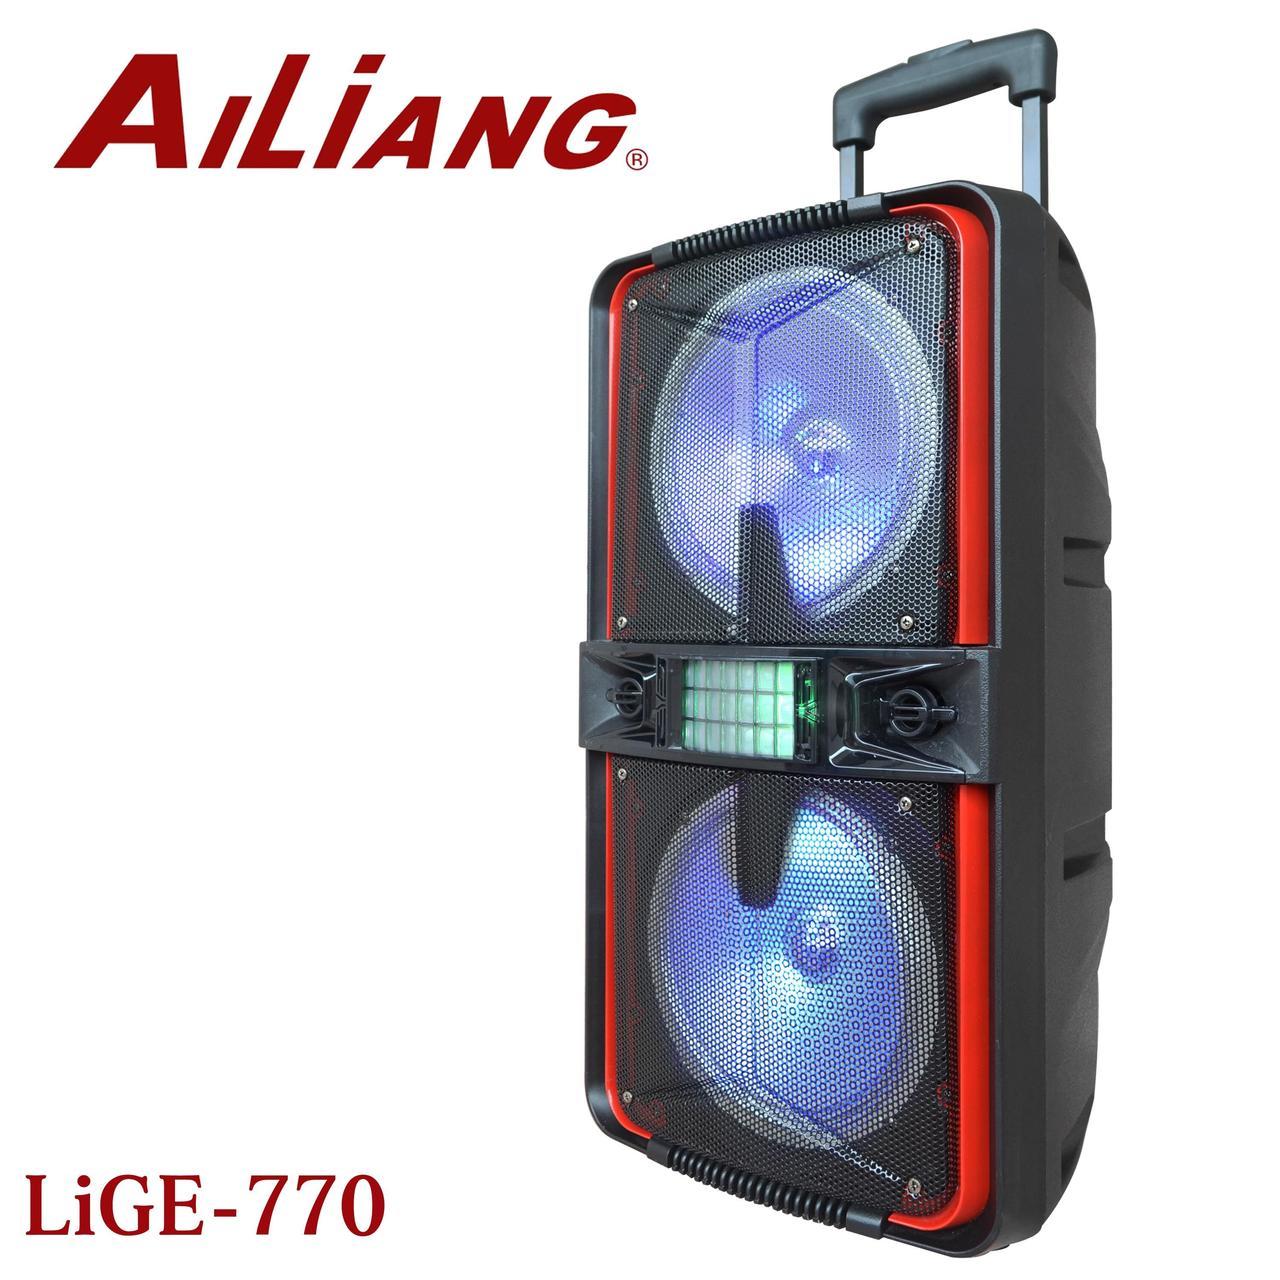 Акустическая система Ailiang LiGE-770